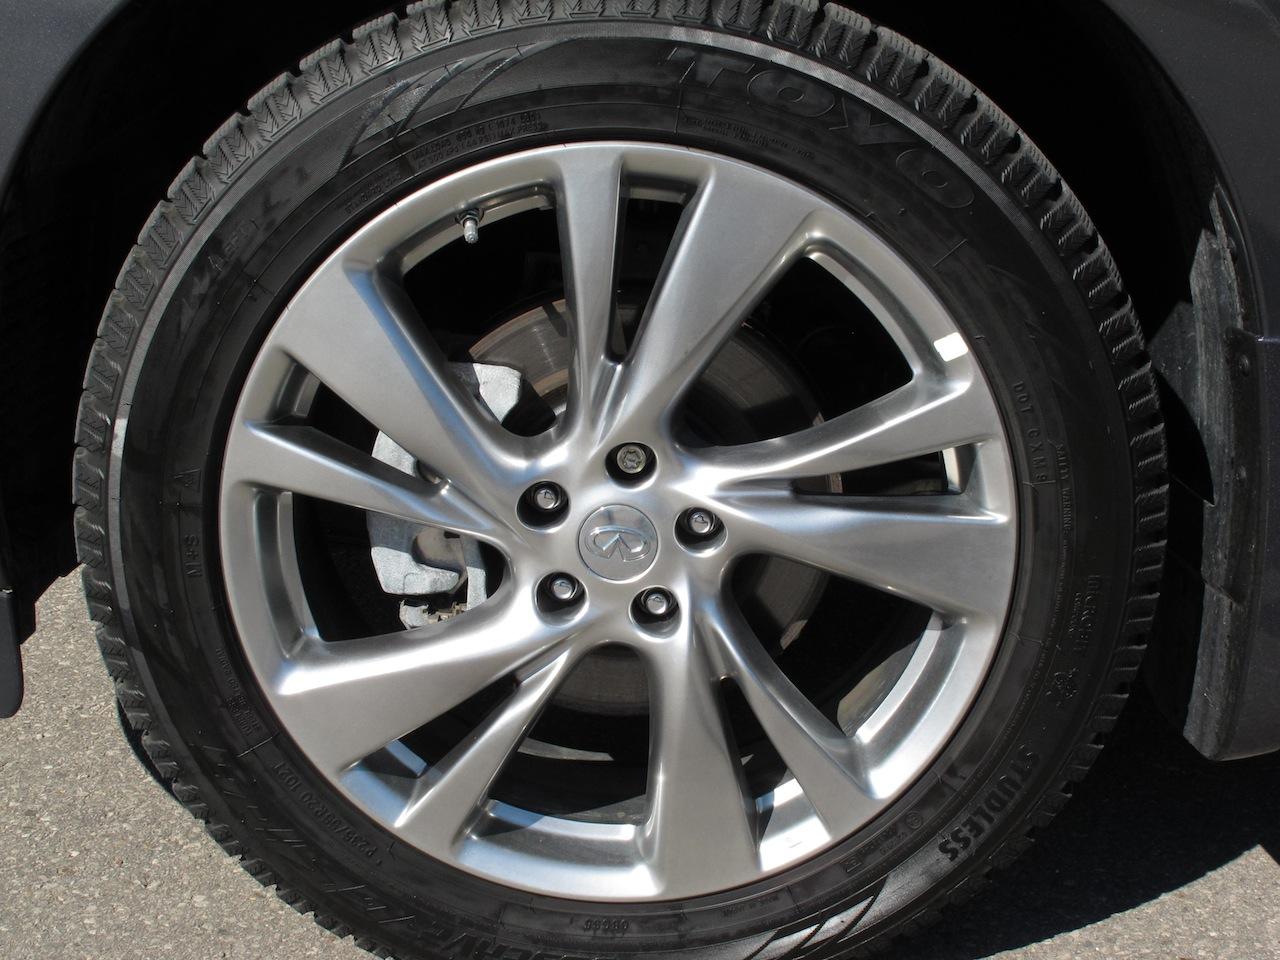 qx60 wheels  eBay